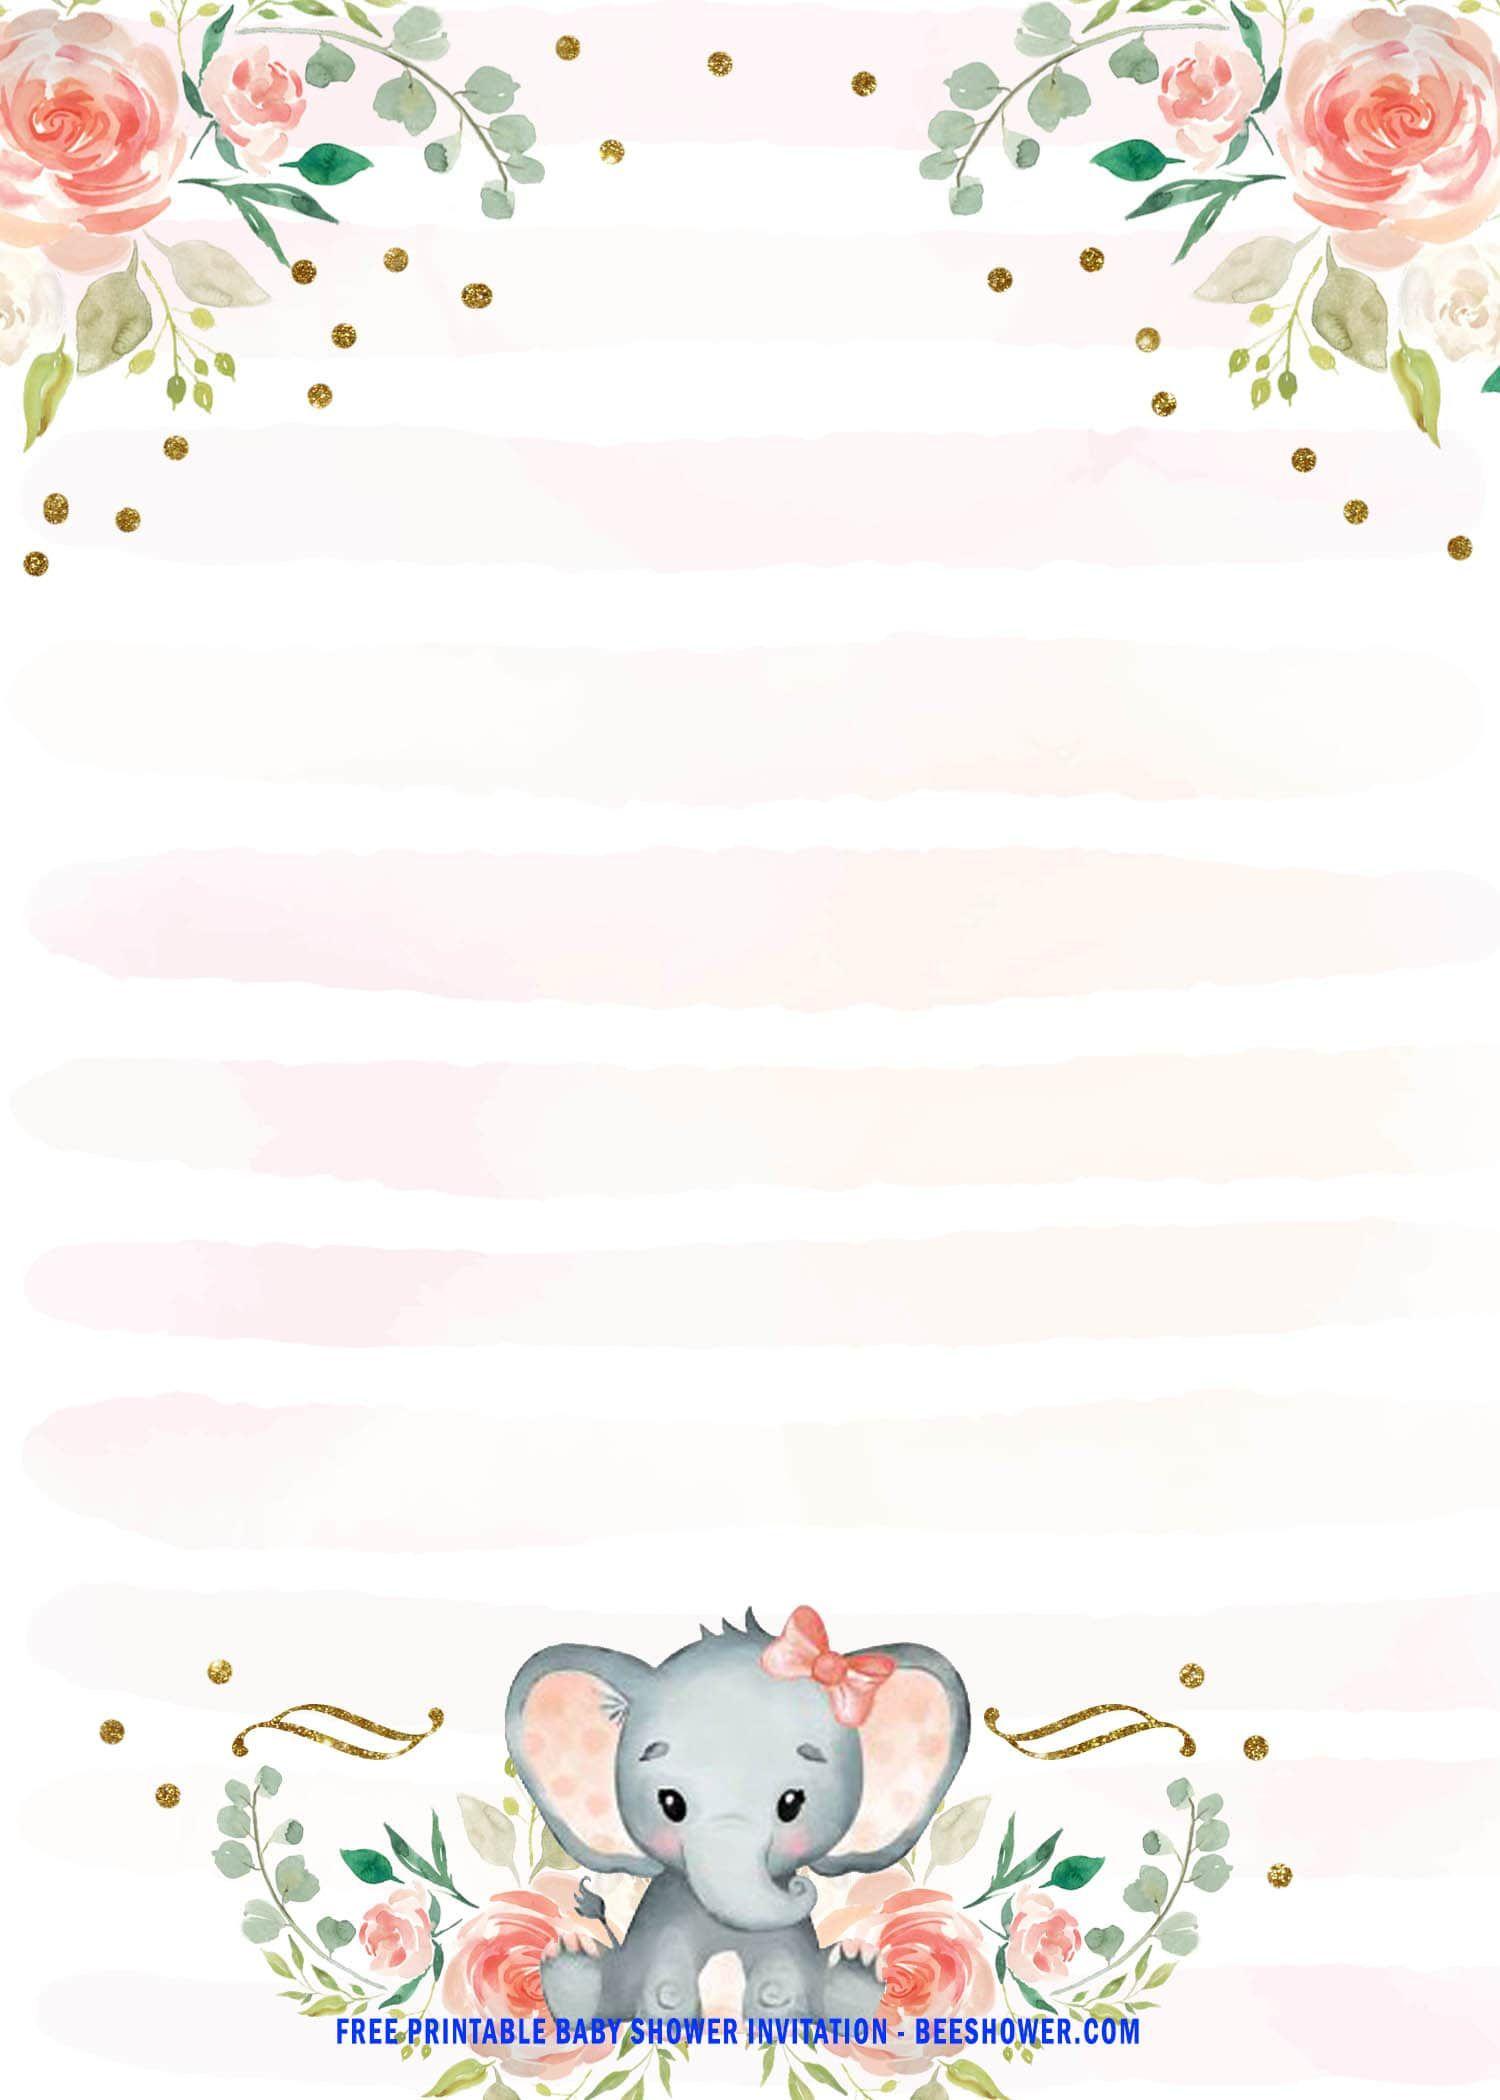 Pink Elephant Baby Shower Free Printables : elephant, shower, printables, Printable, Elephant, Shower, Invitation, Invitations,, Invitations